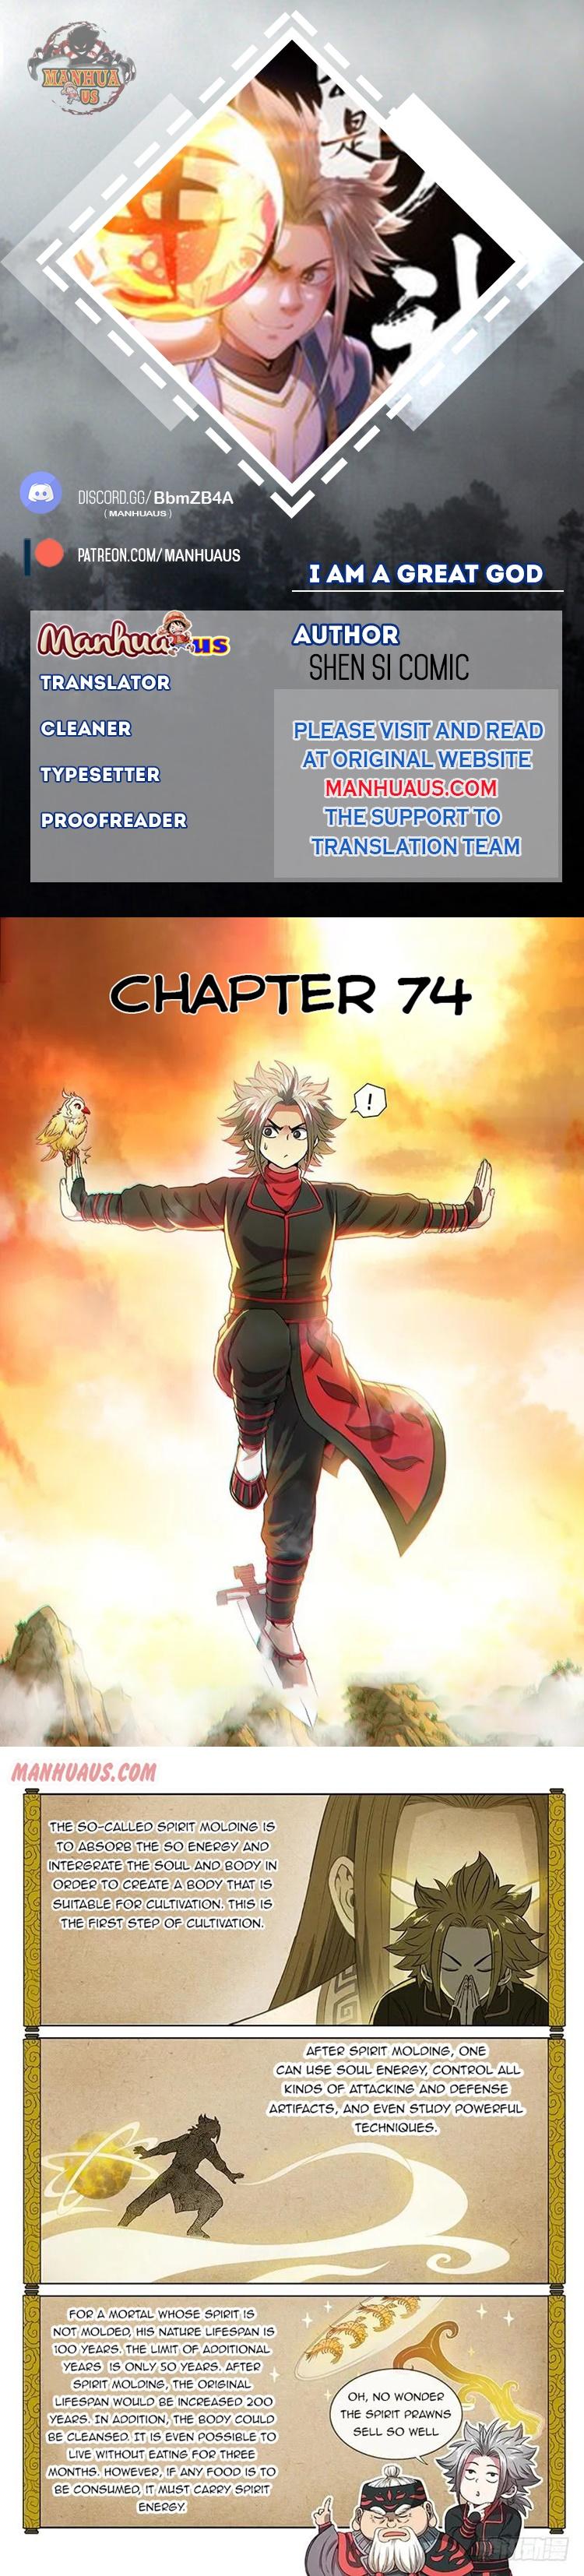 https://manga.mangadogs.com/comics/pic4/4/21124/2823105/2f75f02d15ae1f6ed96adc5761351562.jpg Page 1